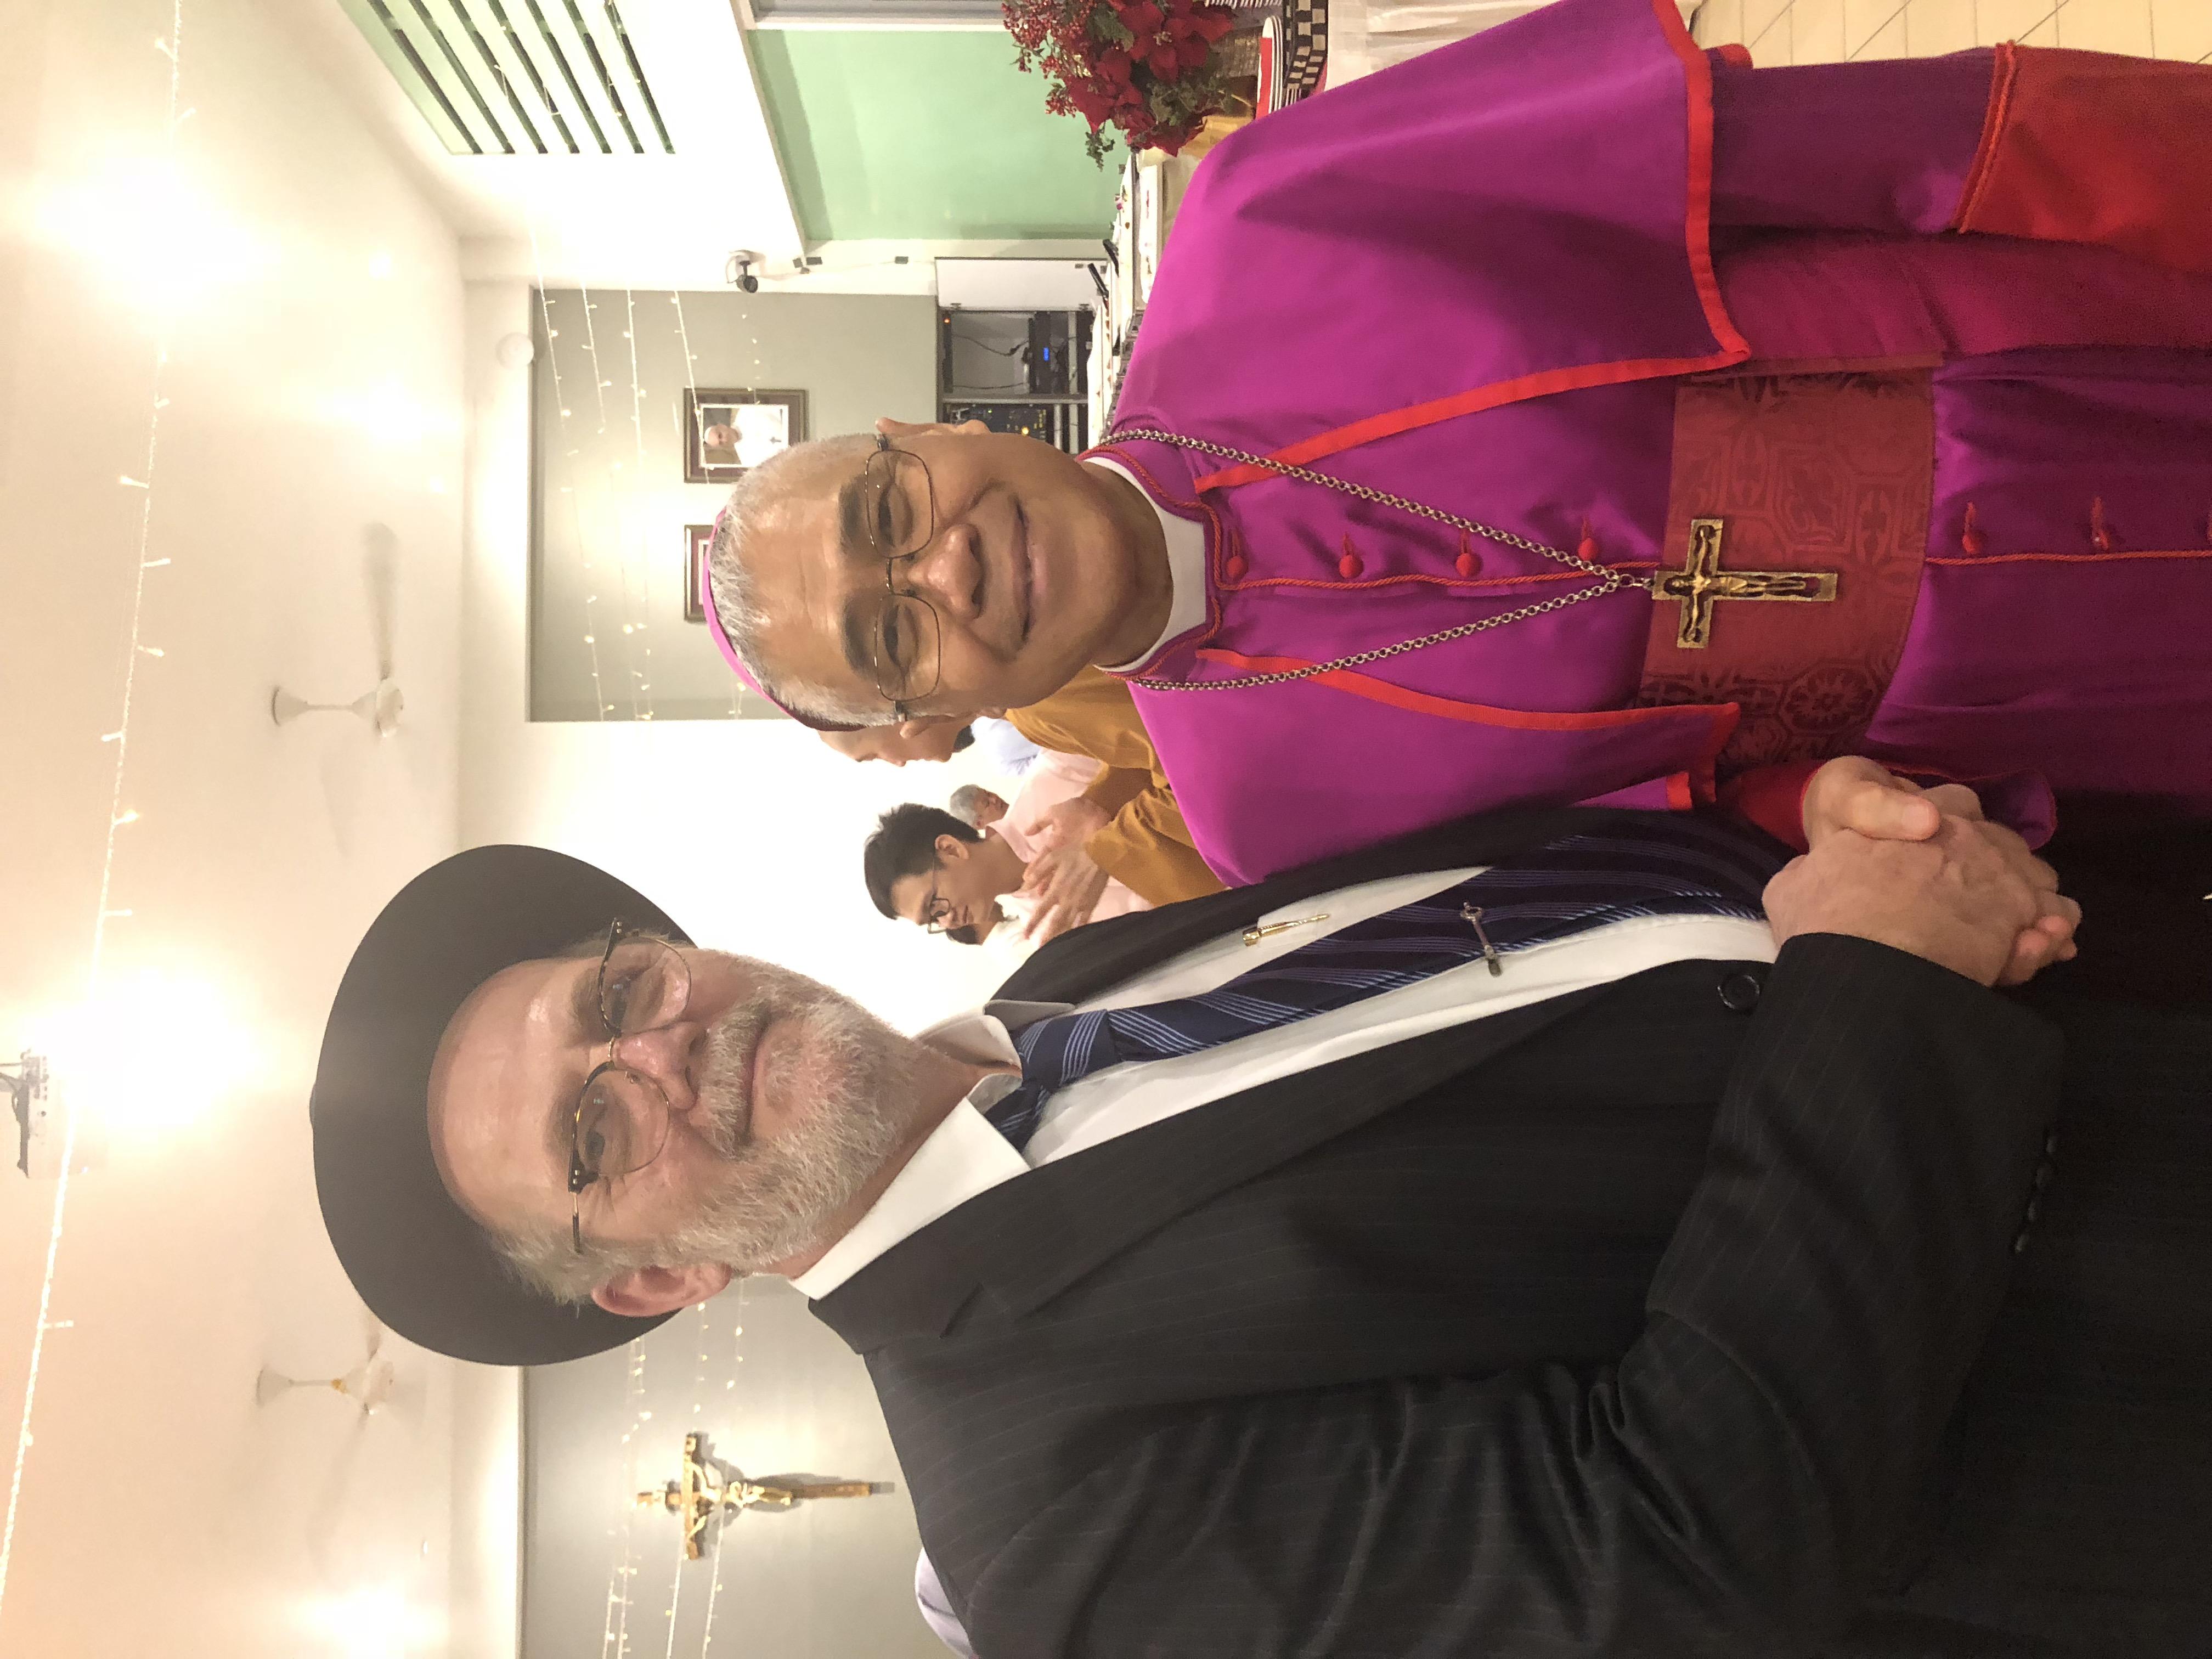 His Grace Archbishop William Goh, Archbishop of Singapore